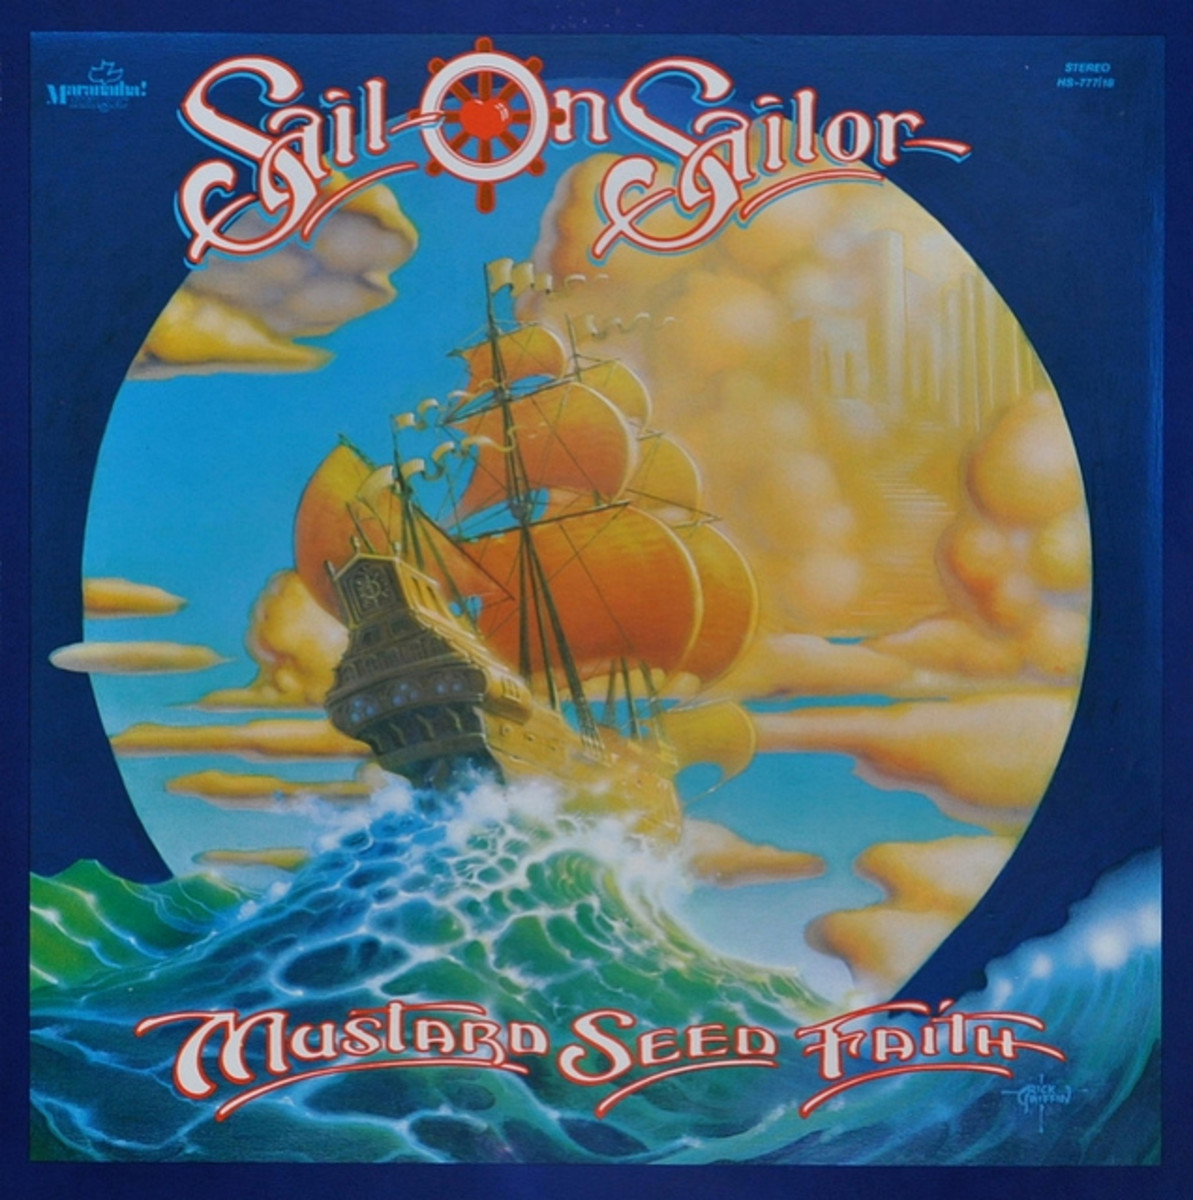 "Sail On Sailor ""Mustard Seed Faith"" Maranatha! Music 12"" LP vinyl record, US Pressing (1975) Album Cover Art by Rick Griffin"